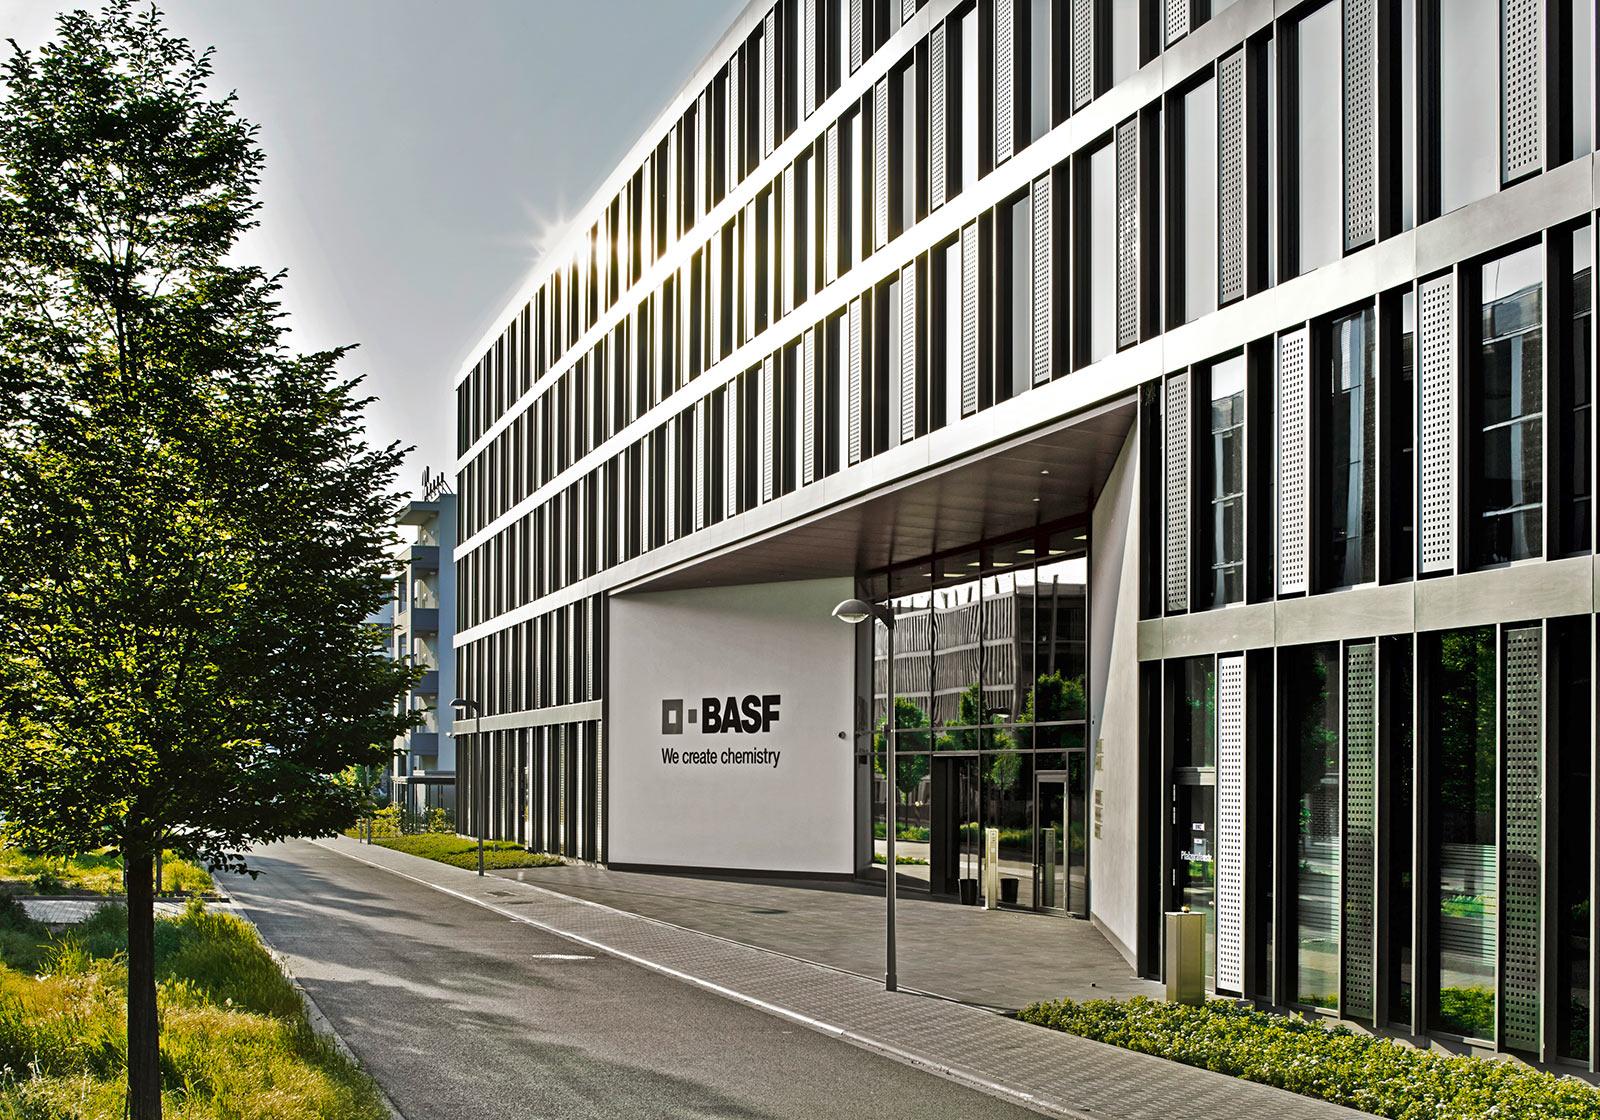 BASF Людвигсхафен, Германия